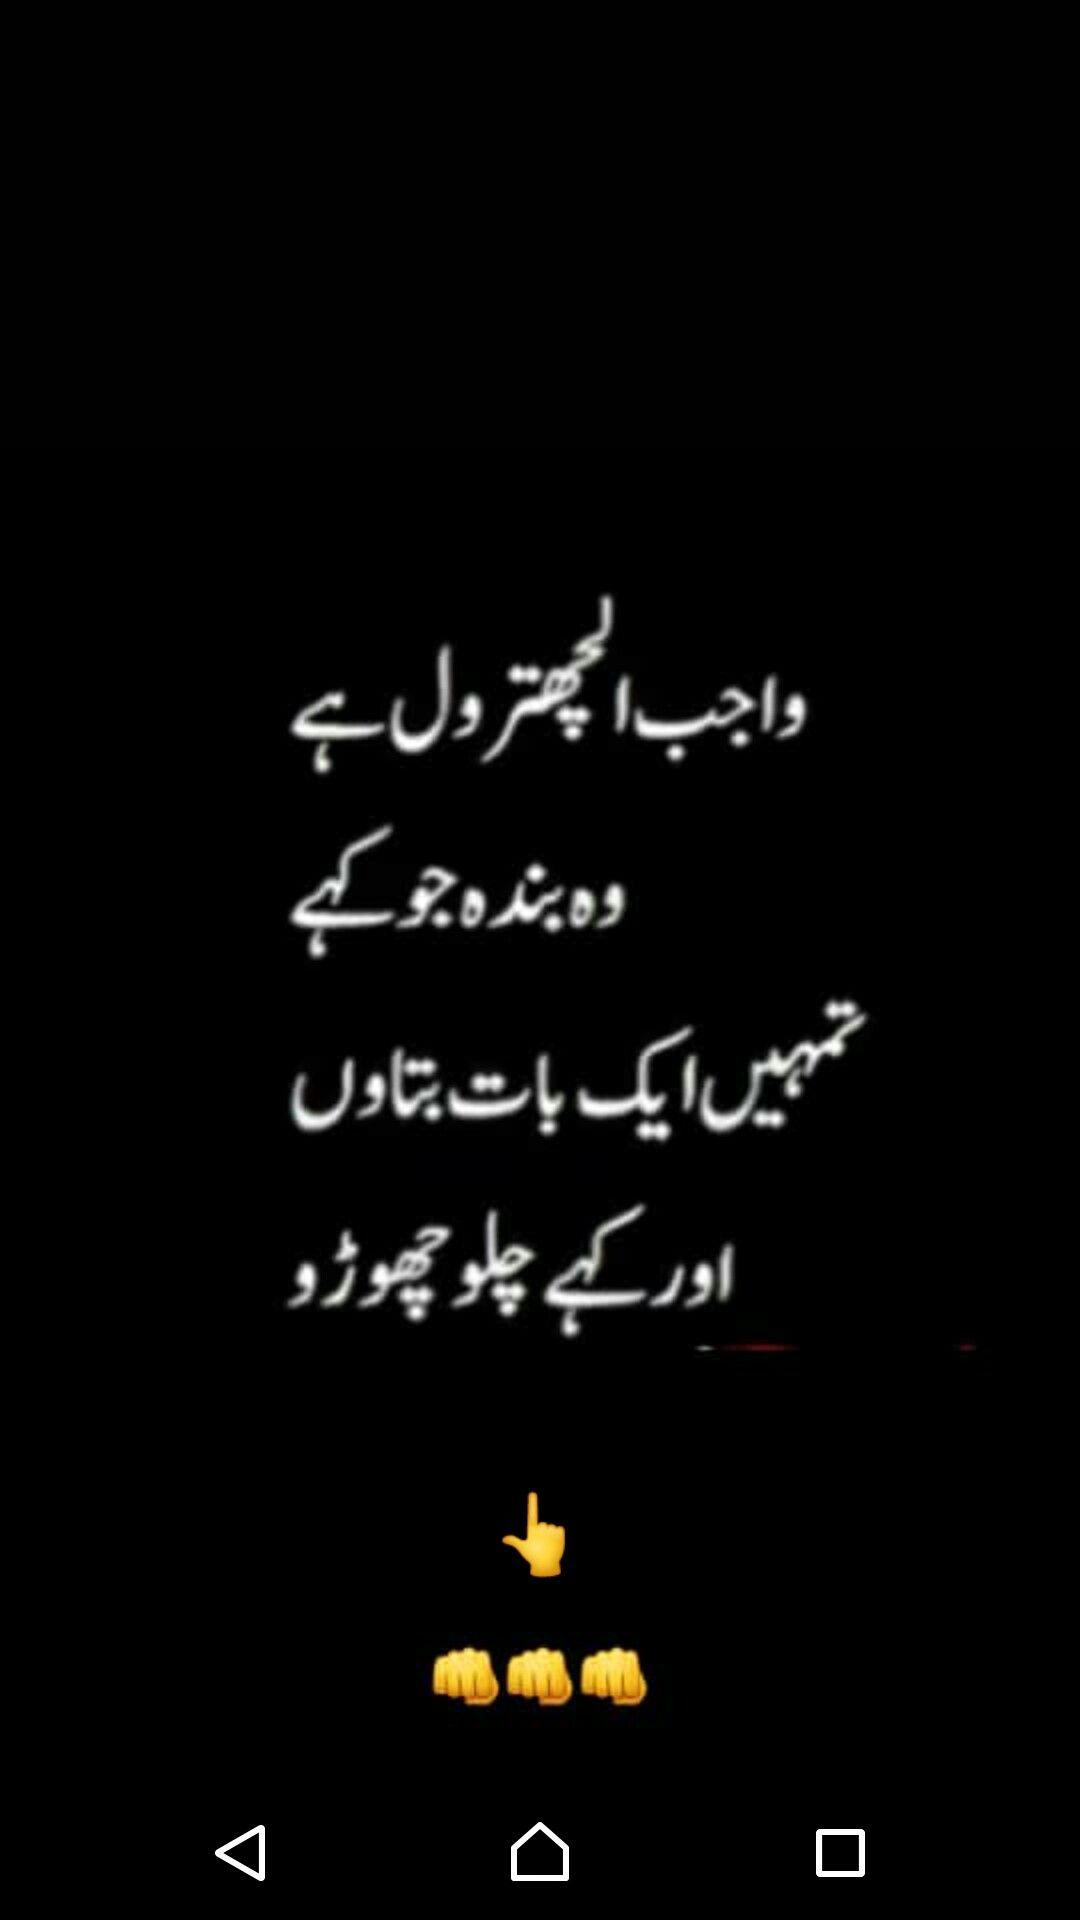 Daniyalmujahid Funny Quotes For Whatsapp Fun Quotes Funny Urdu Funny Quotes